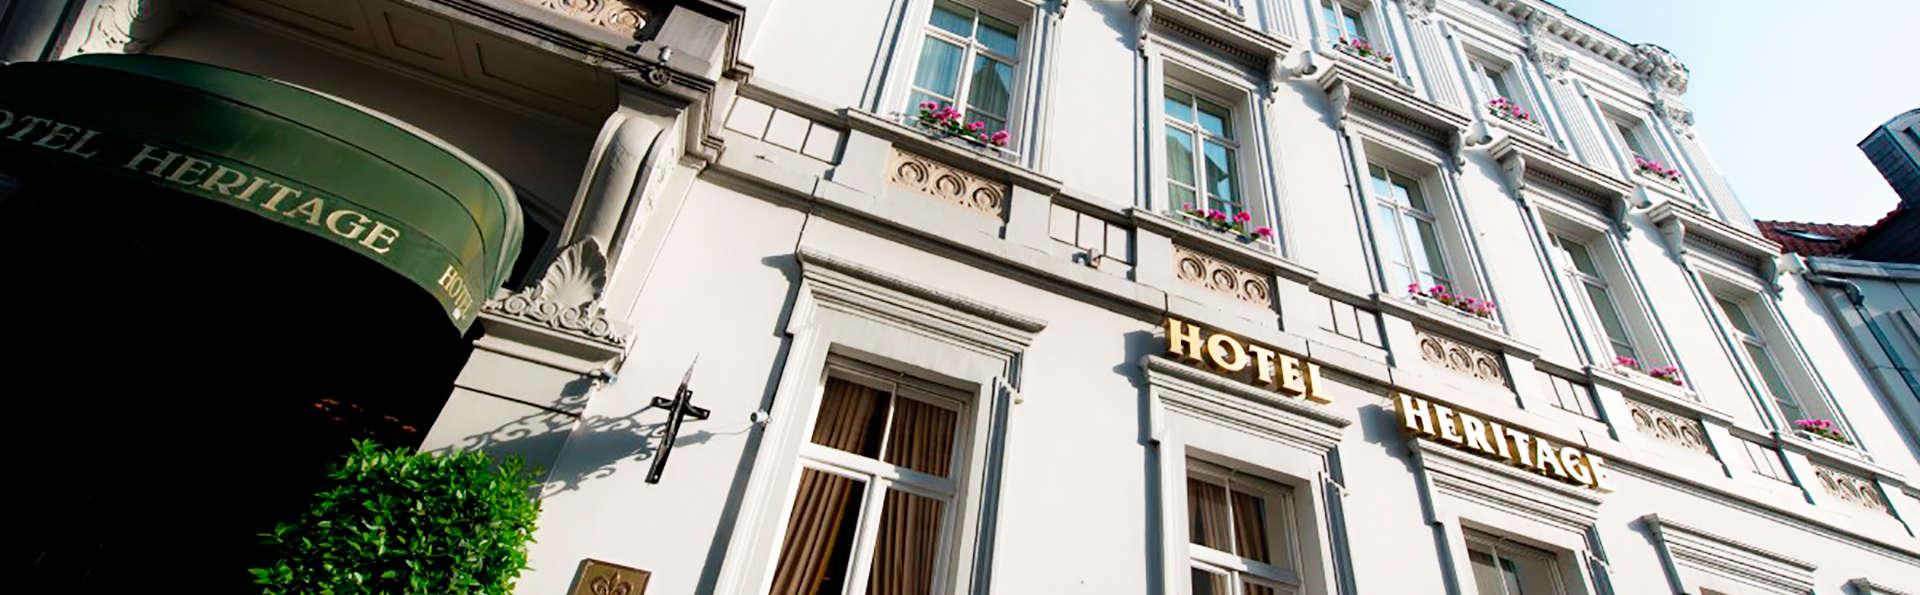 Relais & Châteaux Hotel Heritage - EDIT_front.jpg